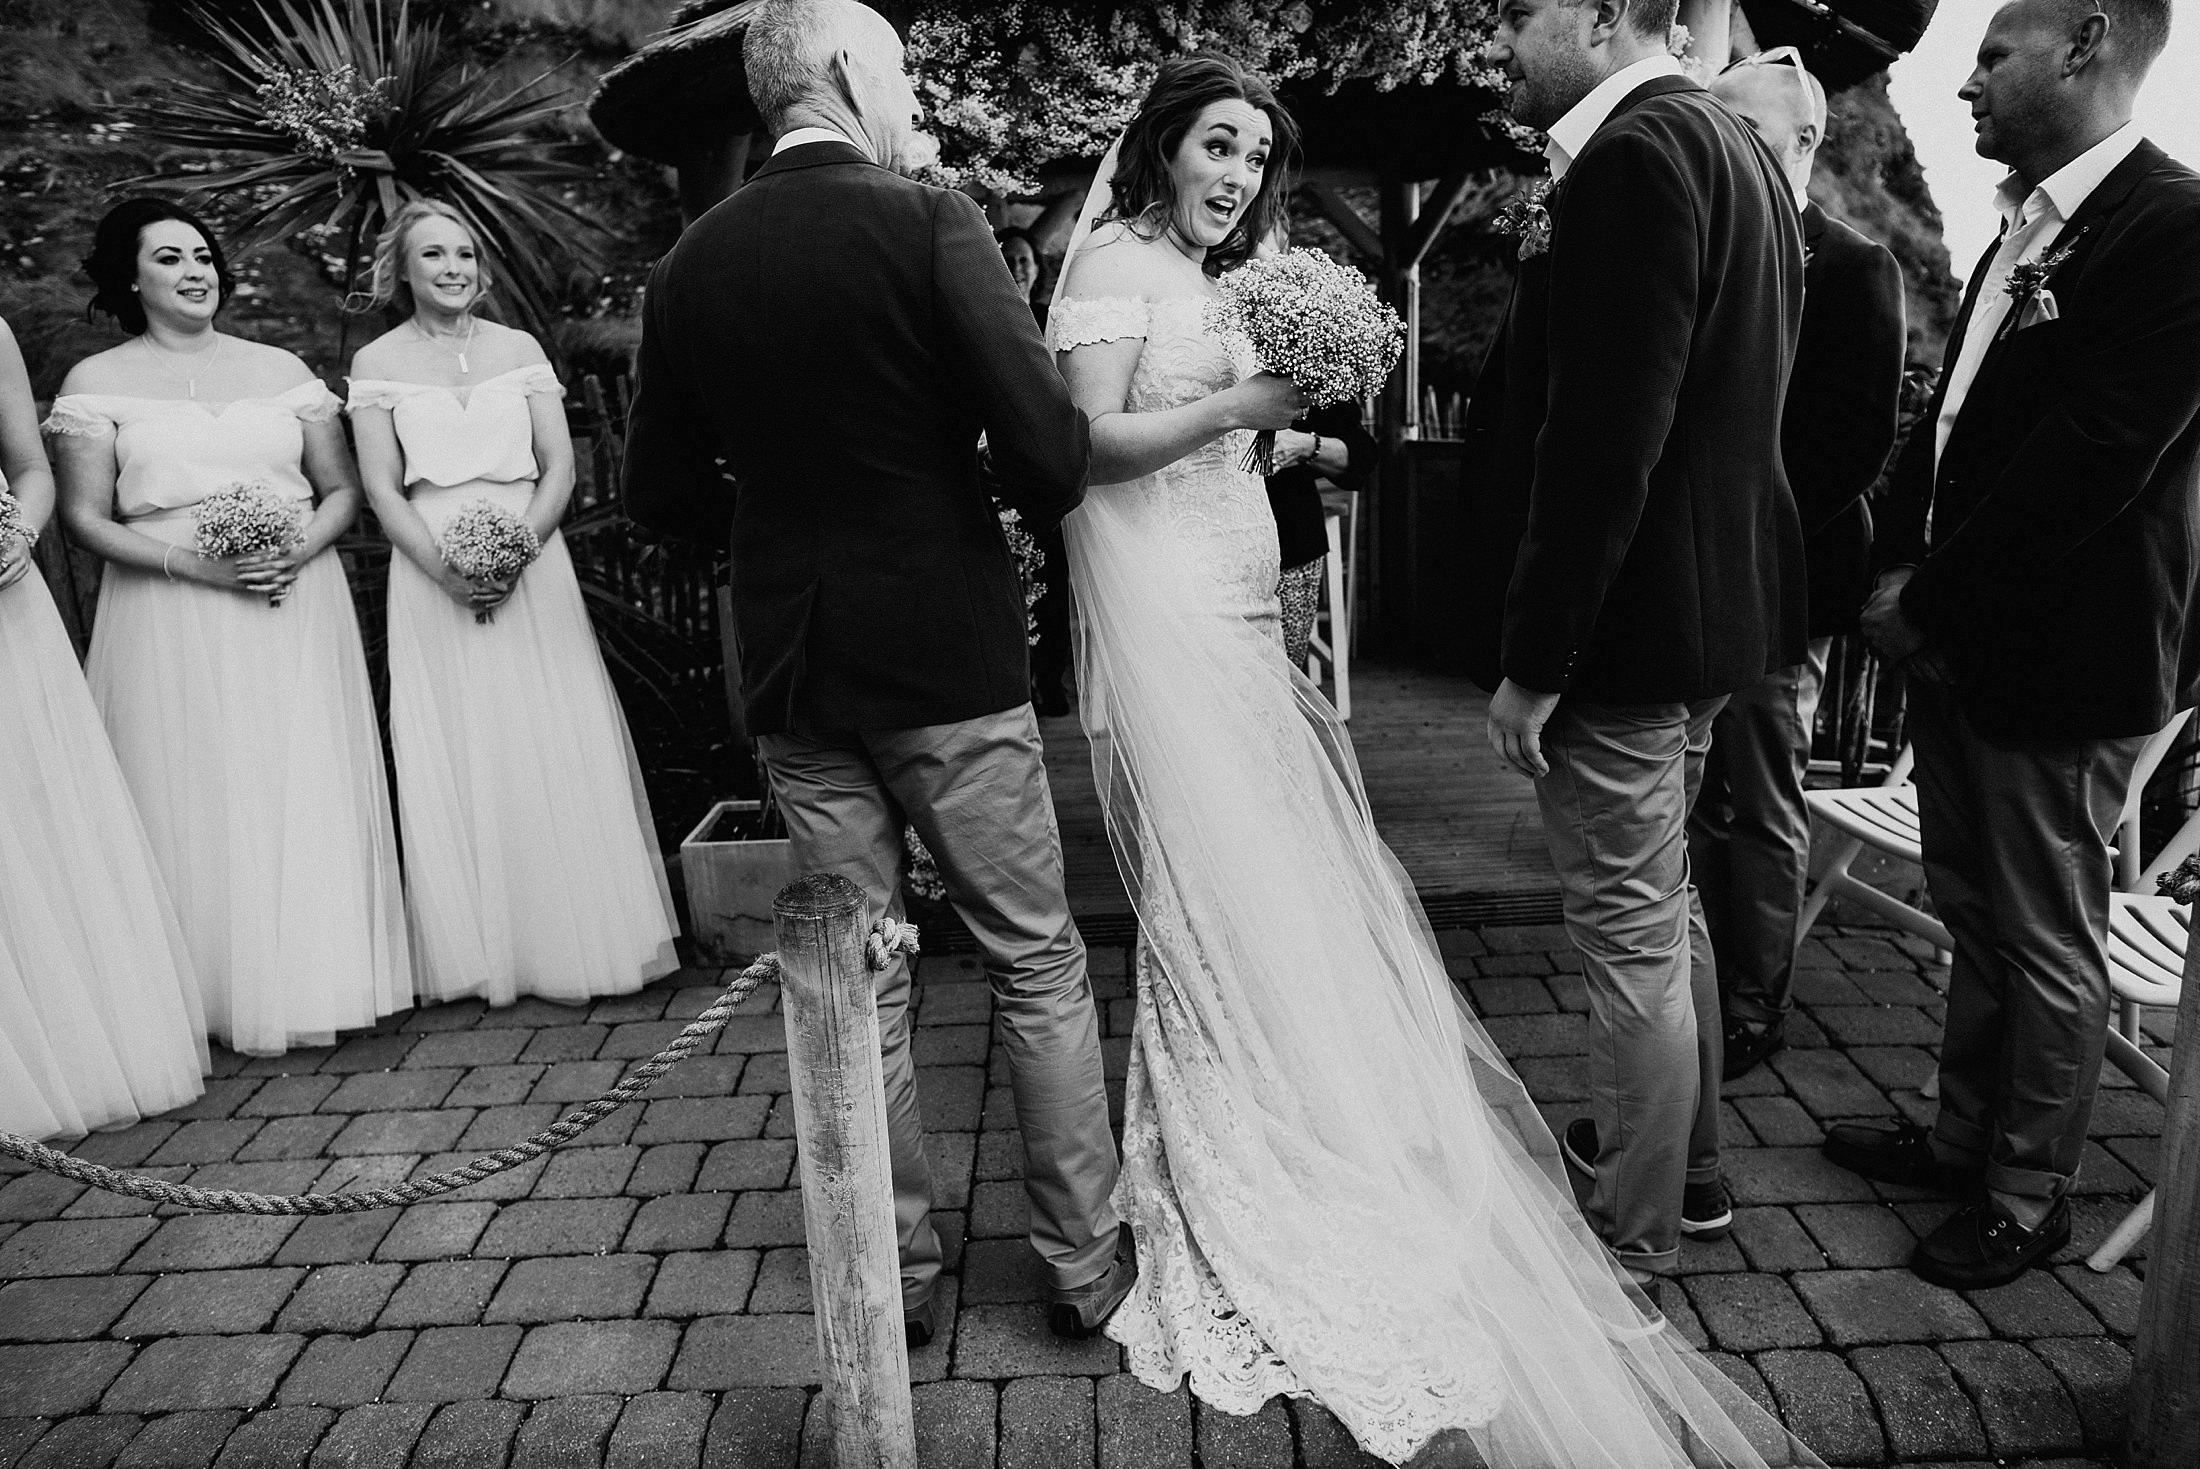 Tunnels Beaches Wedding Photography: Wedding Photographer Tunnels Beaches > Becky & Adam